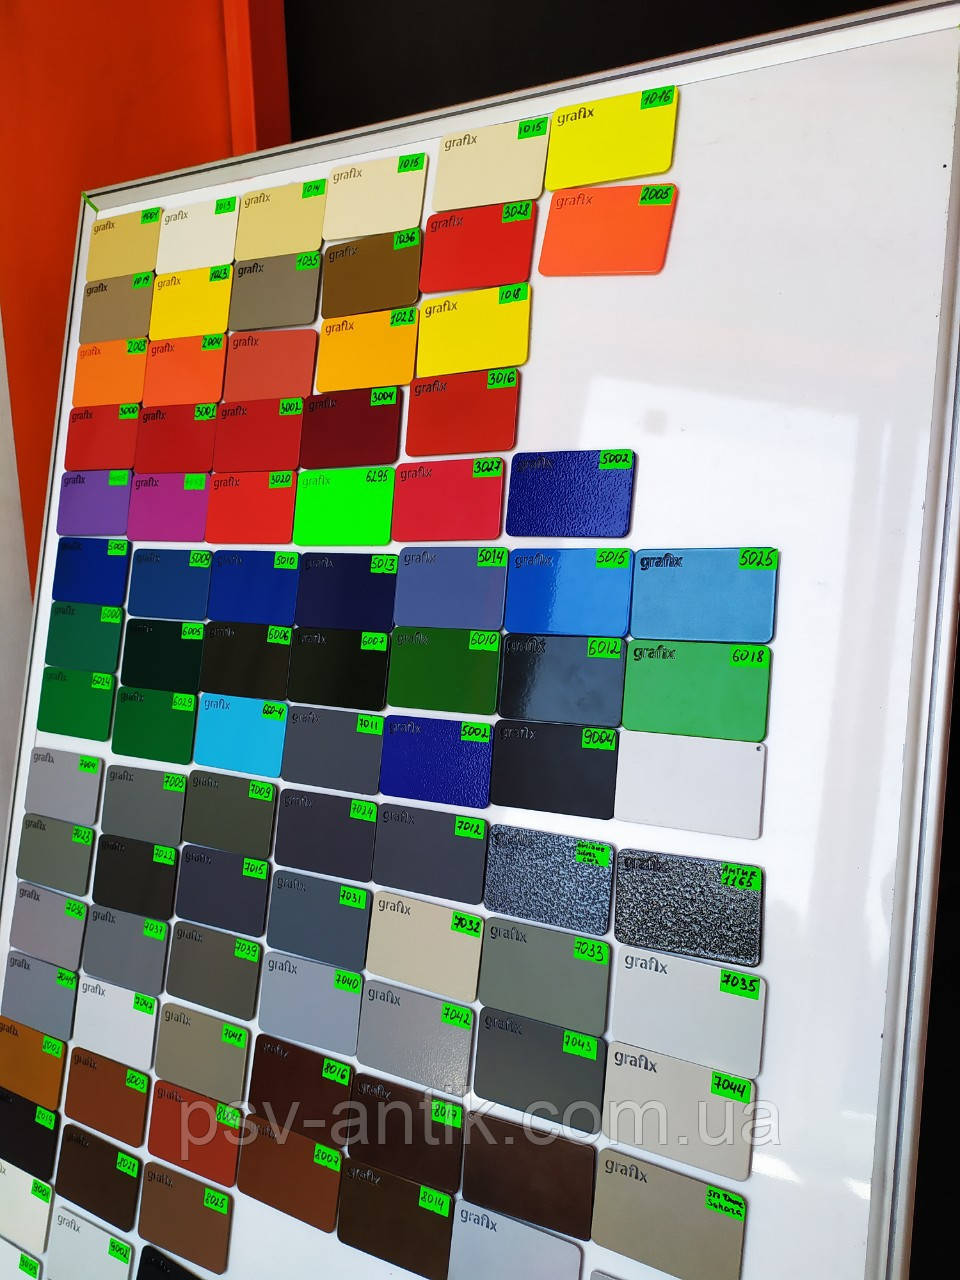 Порошковая краска глянцевая, полиэфирная, архитектурная, 9006